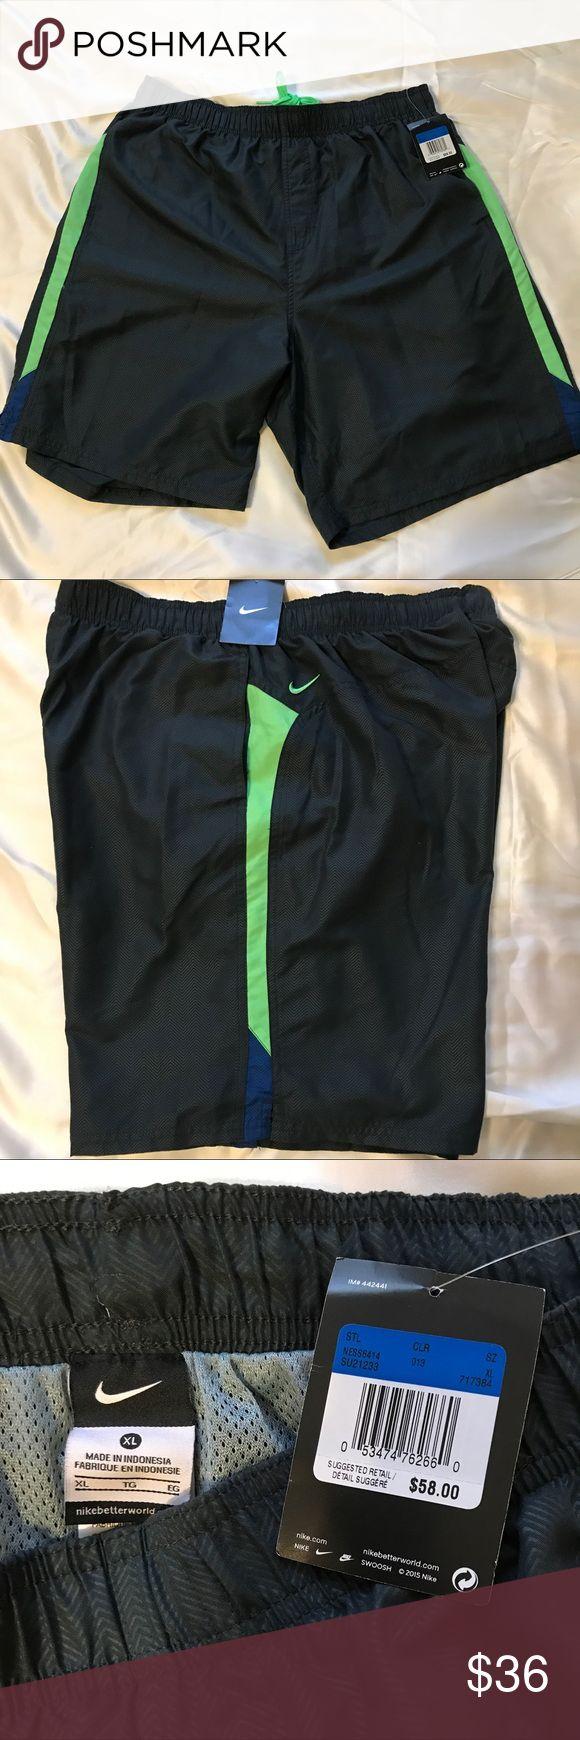 Nike XL Swim Trunks Shorts Gray/Green Nike Swim Trunks/Shorts. Size XL  Gray wave pattern with Neon Green sides and inside tie. Two mesh side pockets. Ine mesh back pocket with Velcro. Mesh liner. Retail $58 Nike Swim Swim Trunks